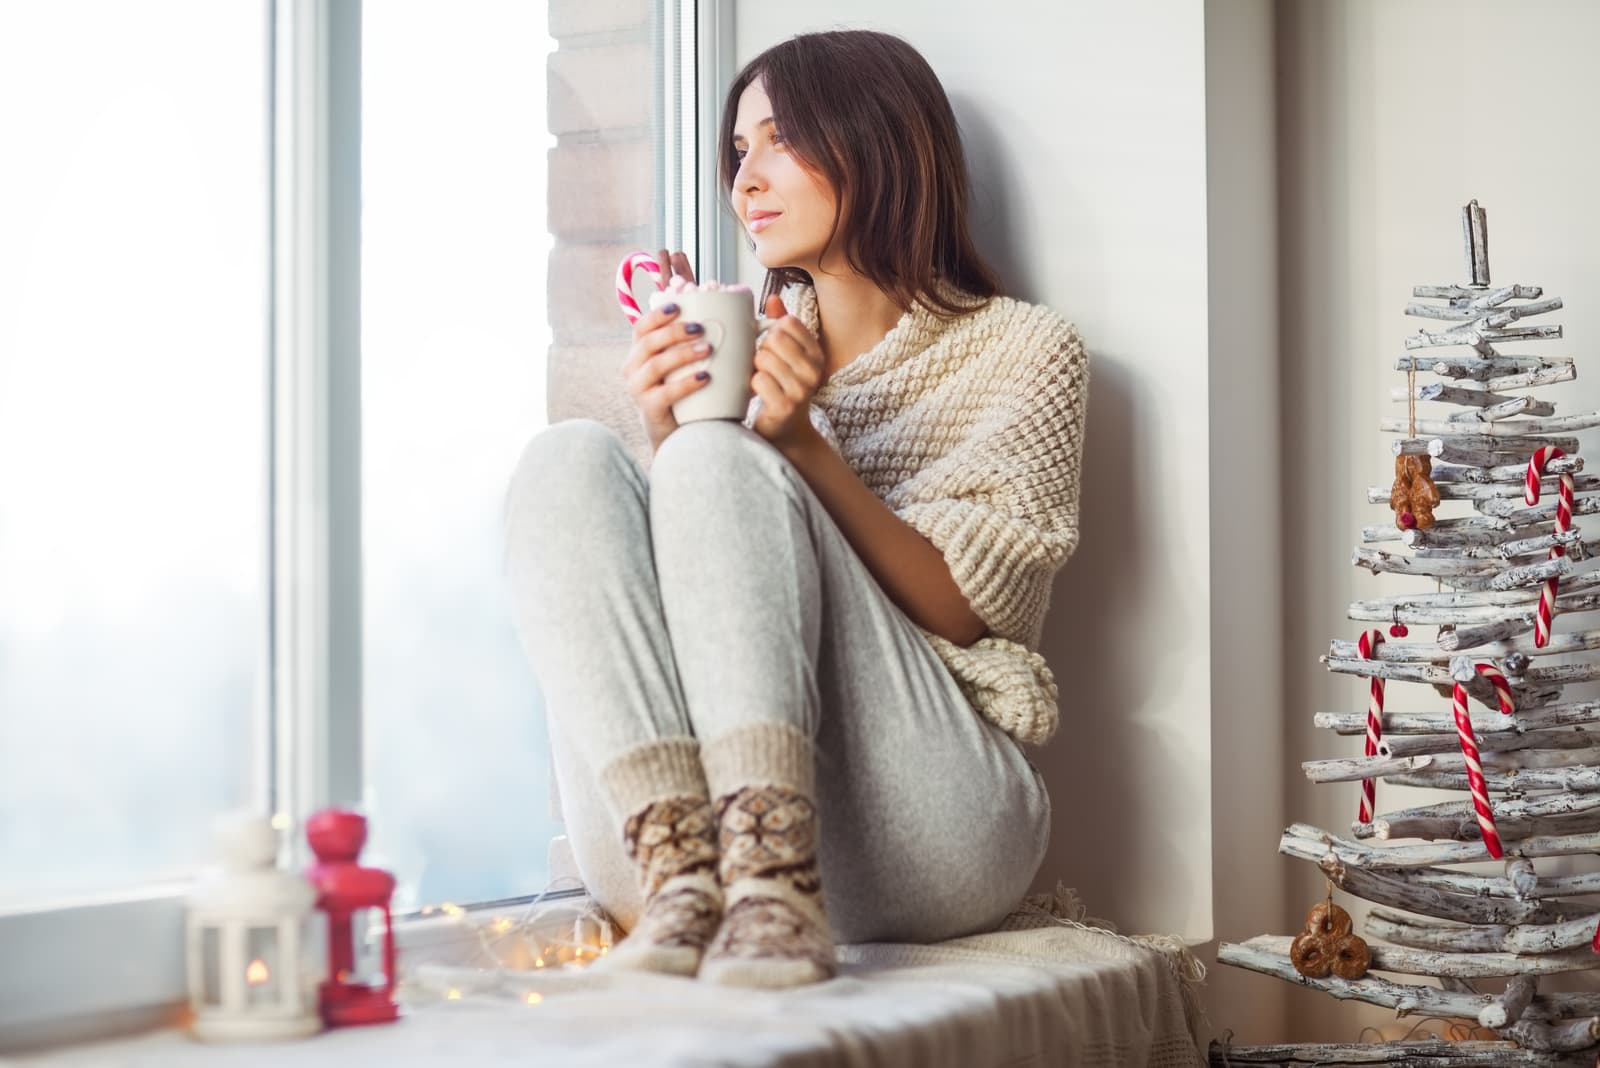 woman drinking hot coffee sitting on window sill